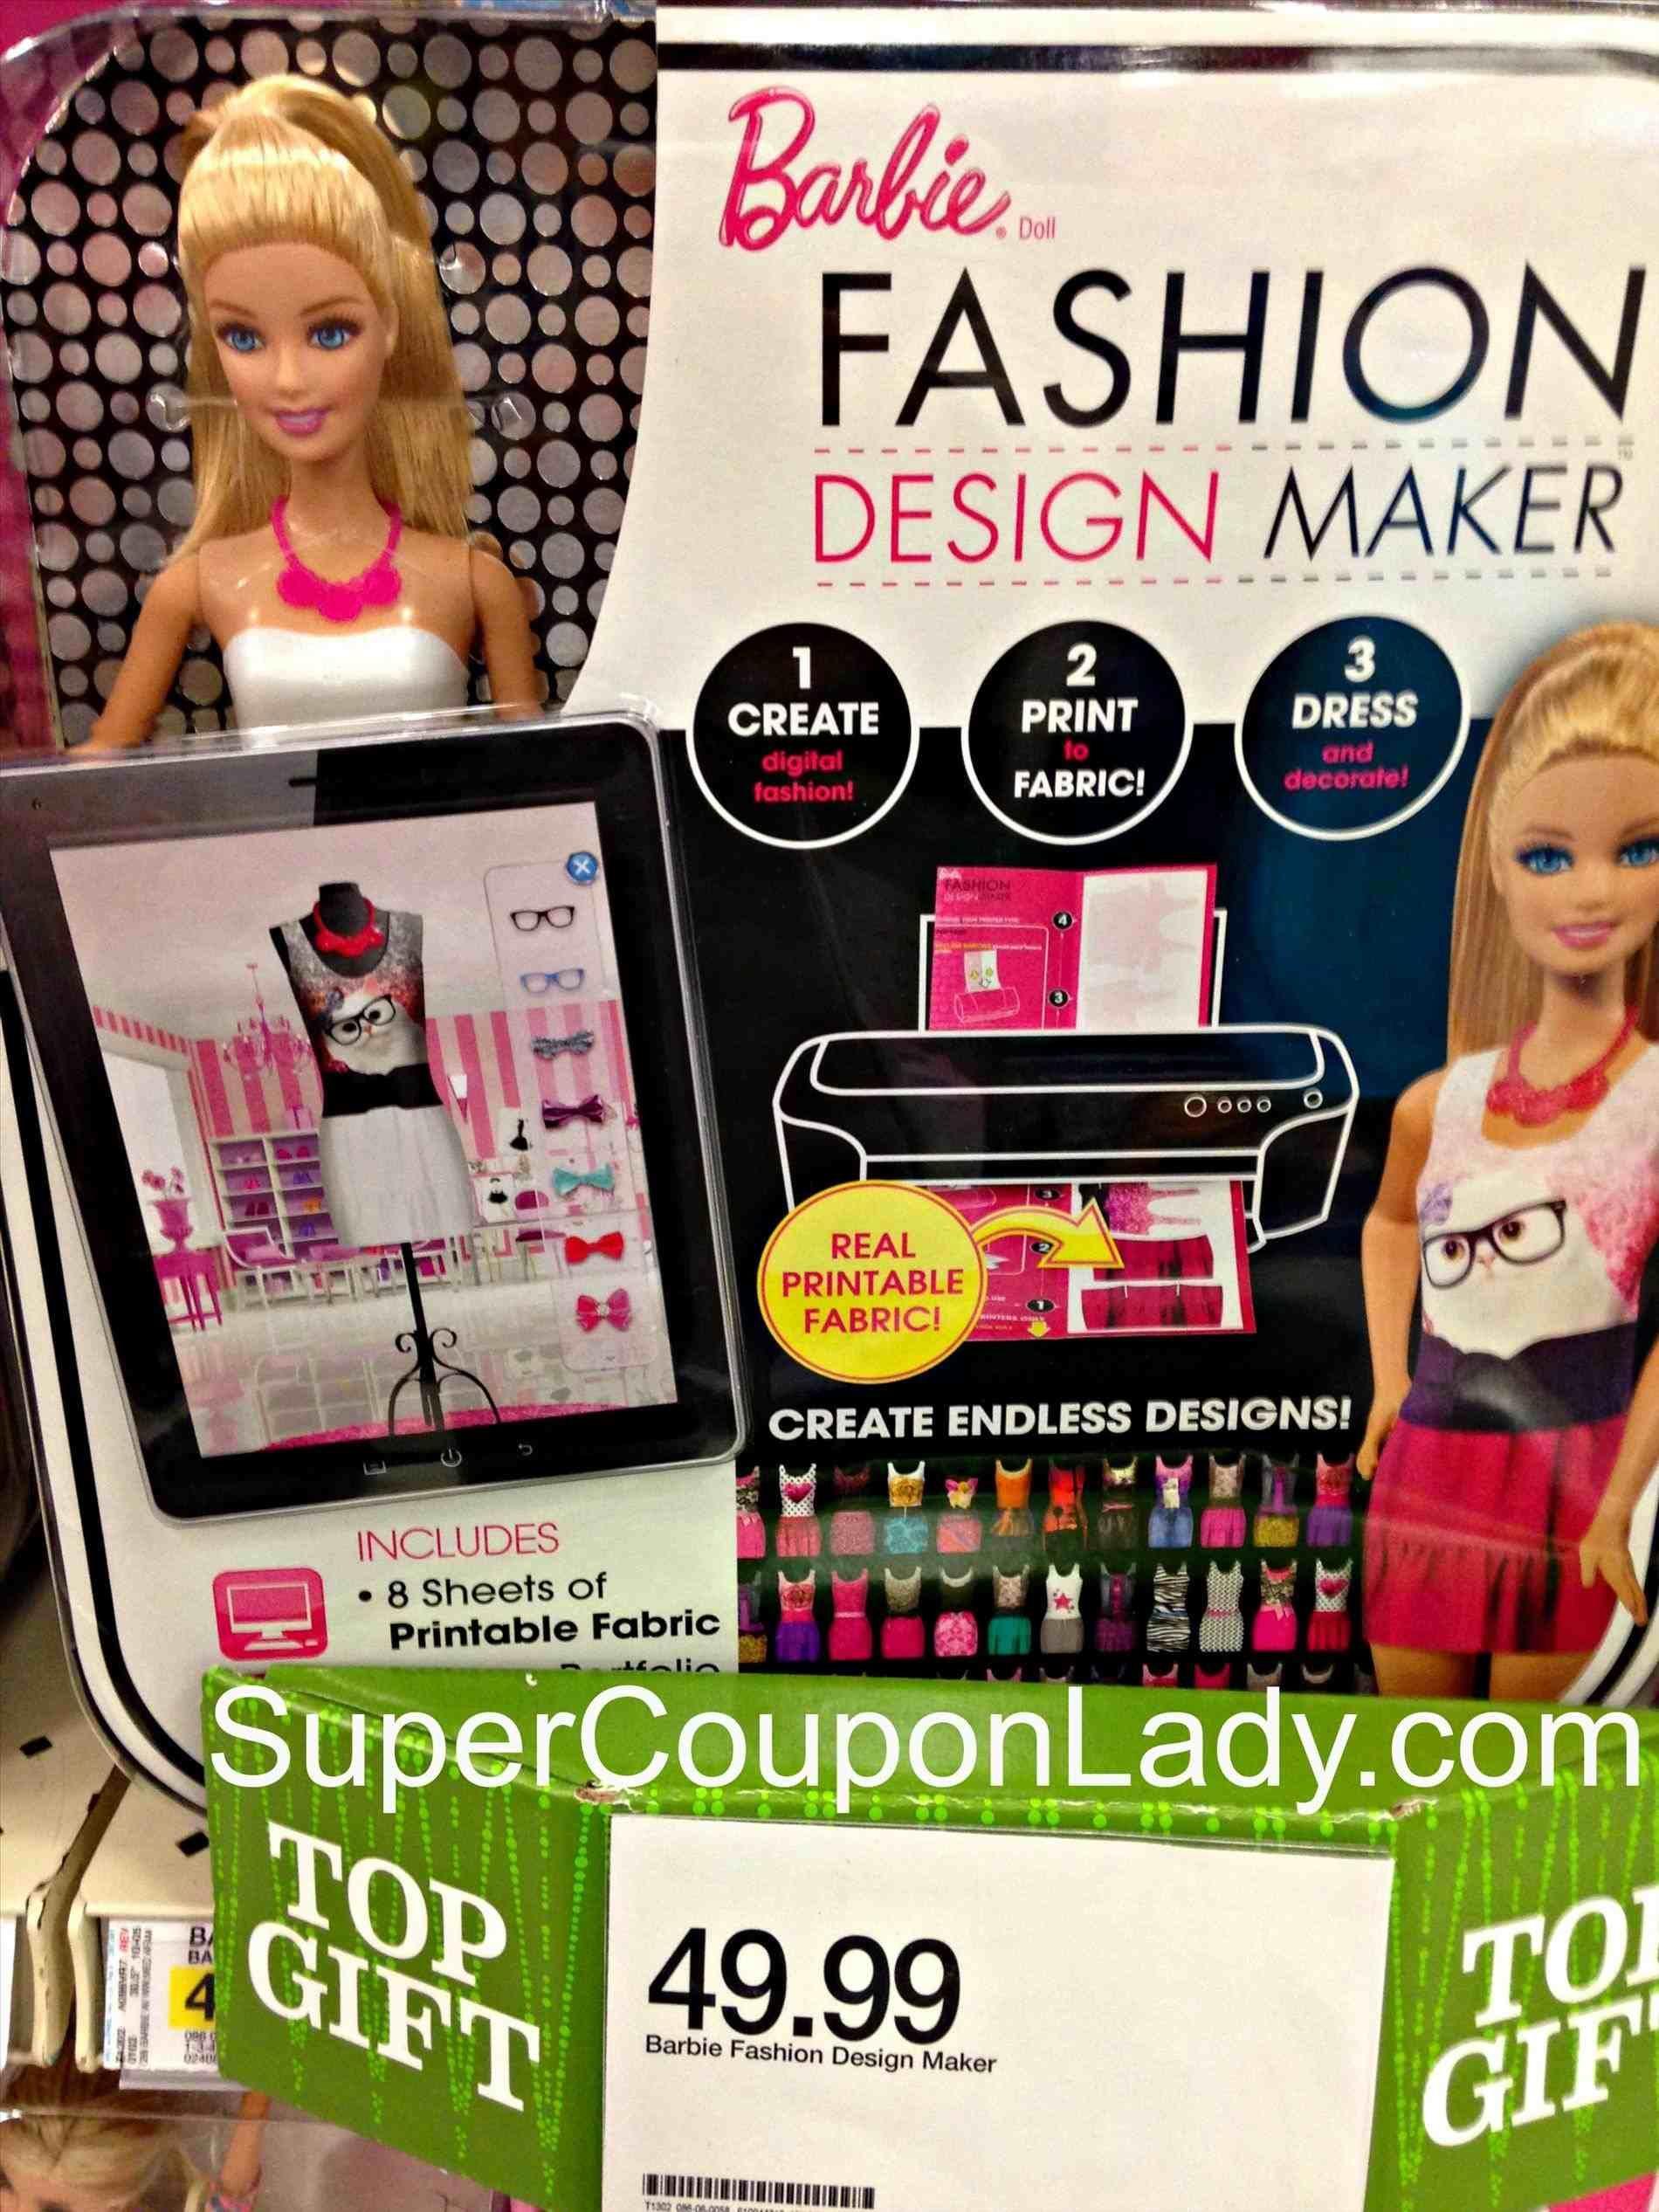 Barbie Fashion Design Maker Barbie Fashion Fashion Design Design Maker